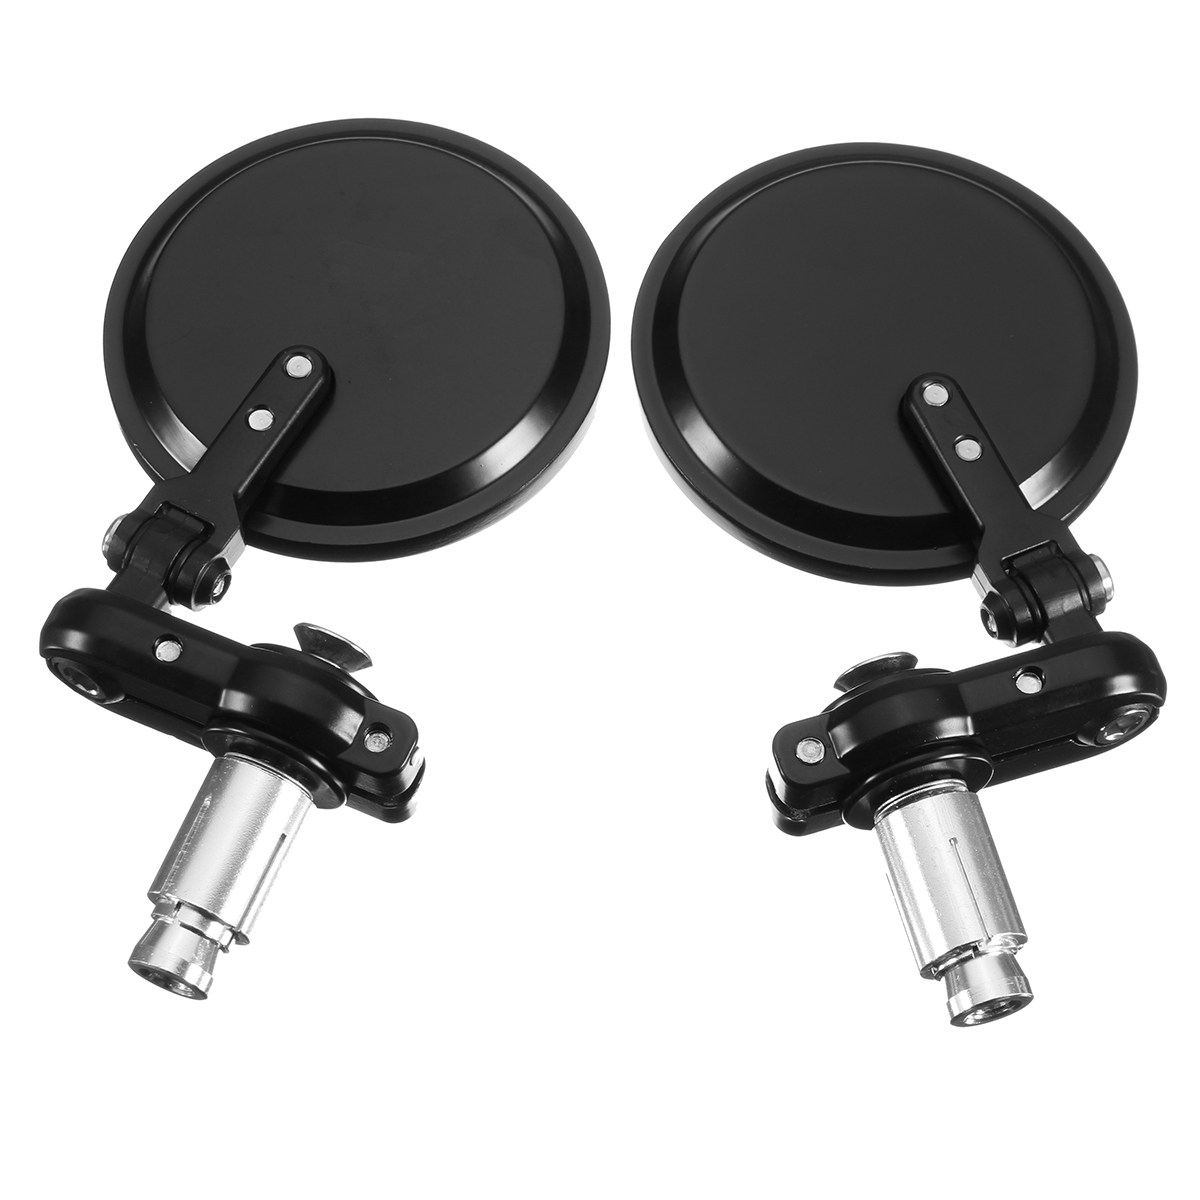 Motorcycle Bike Side Mirrors Black Aluminum Round Style Universal Fits 7/8